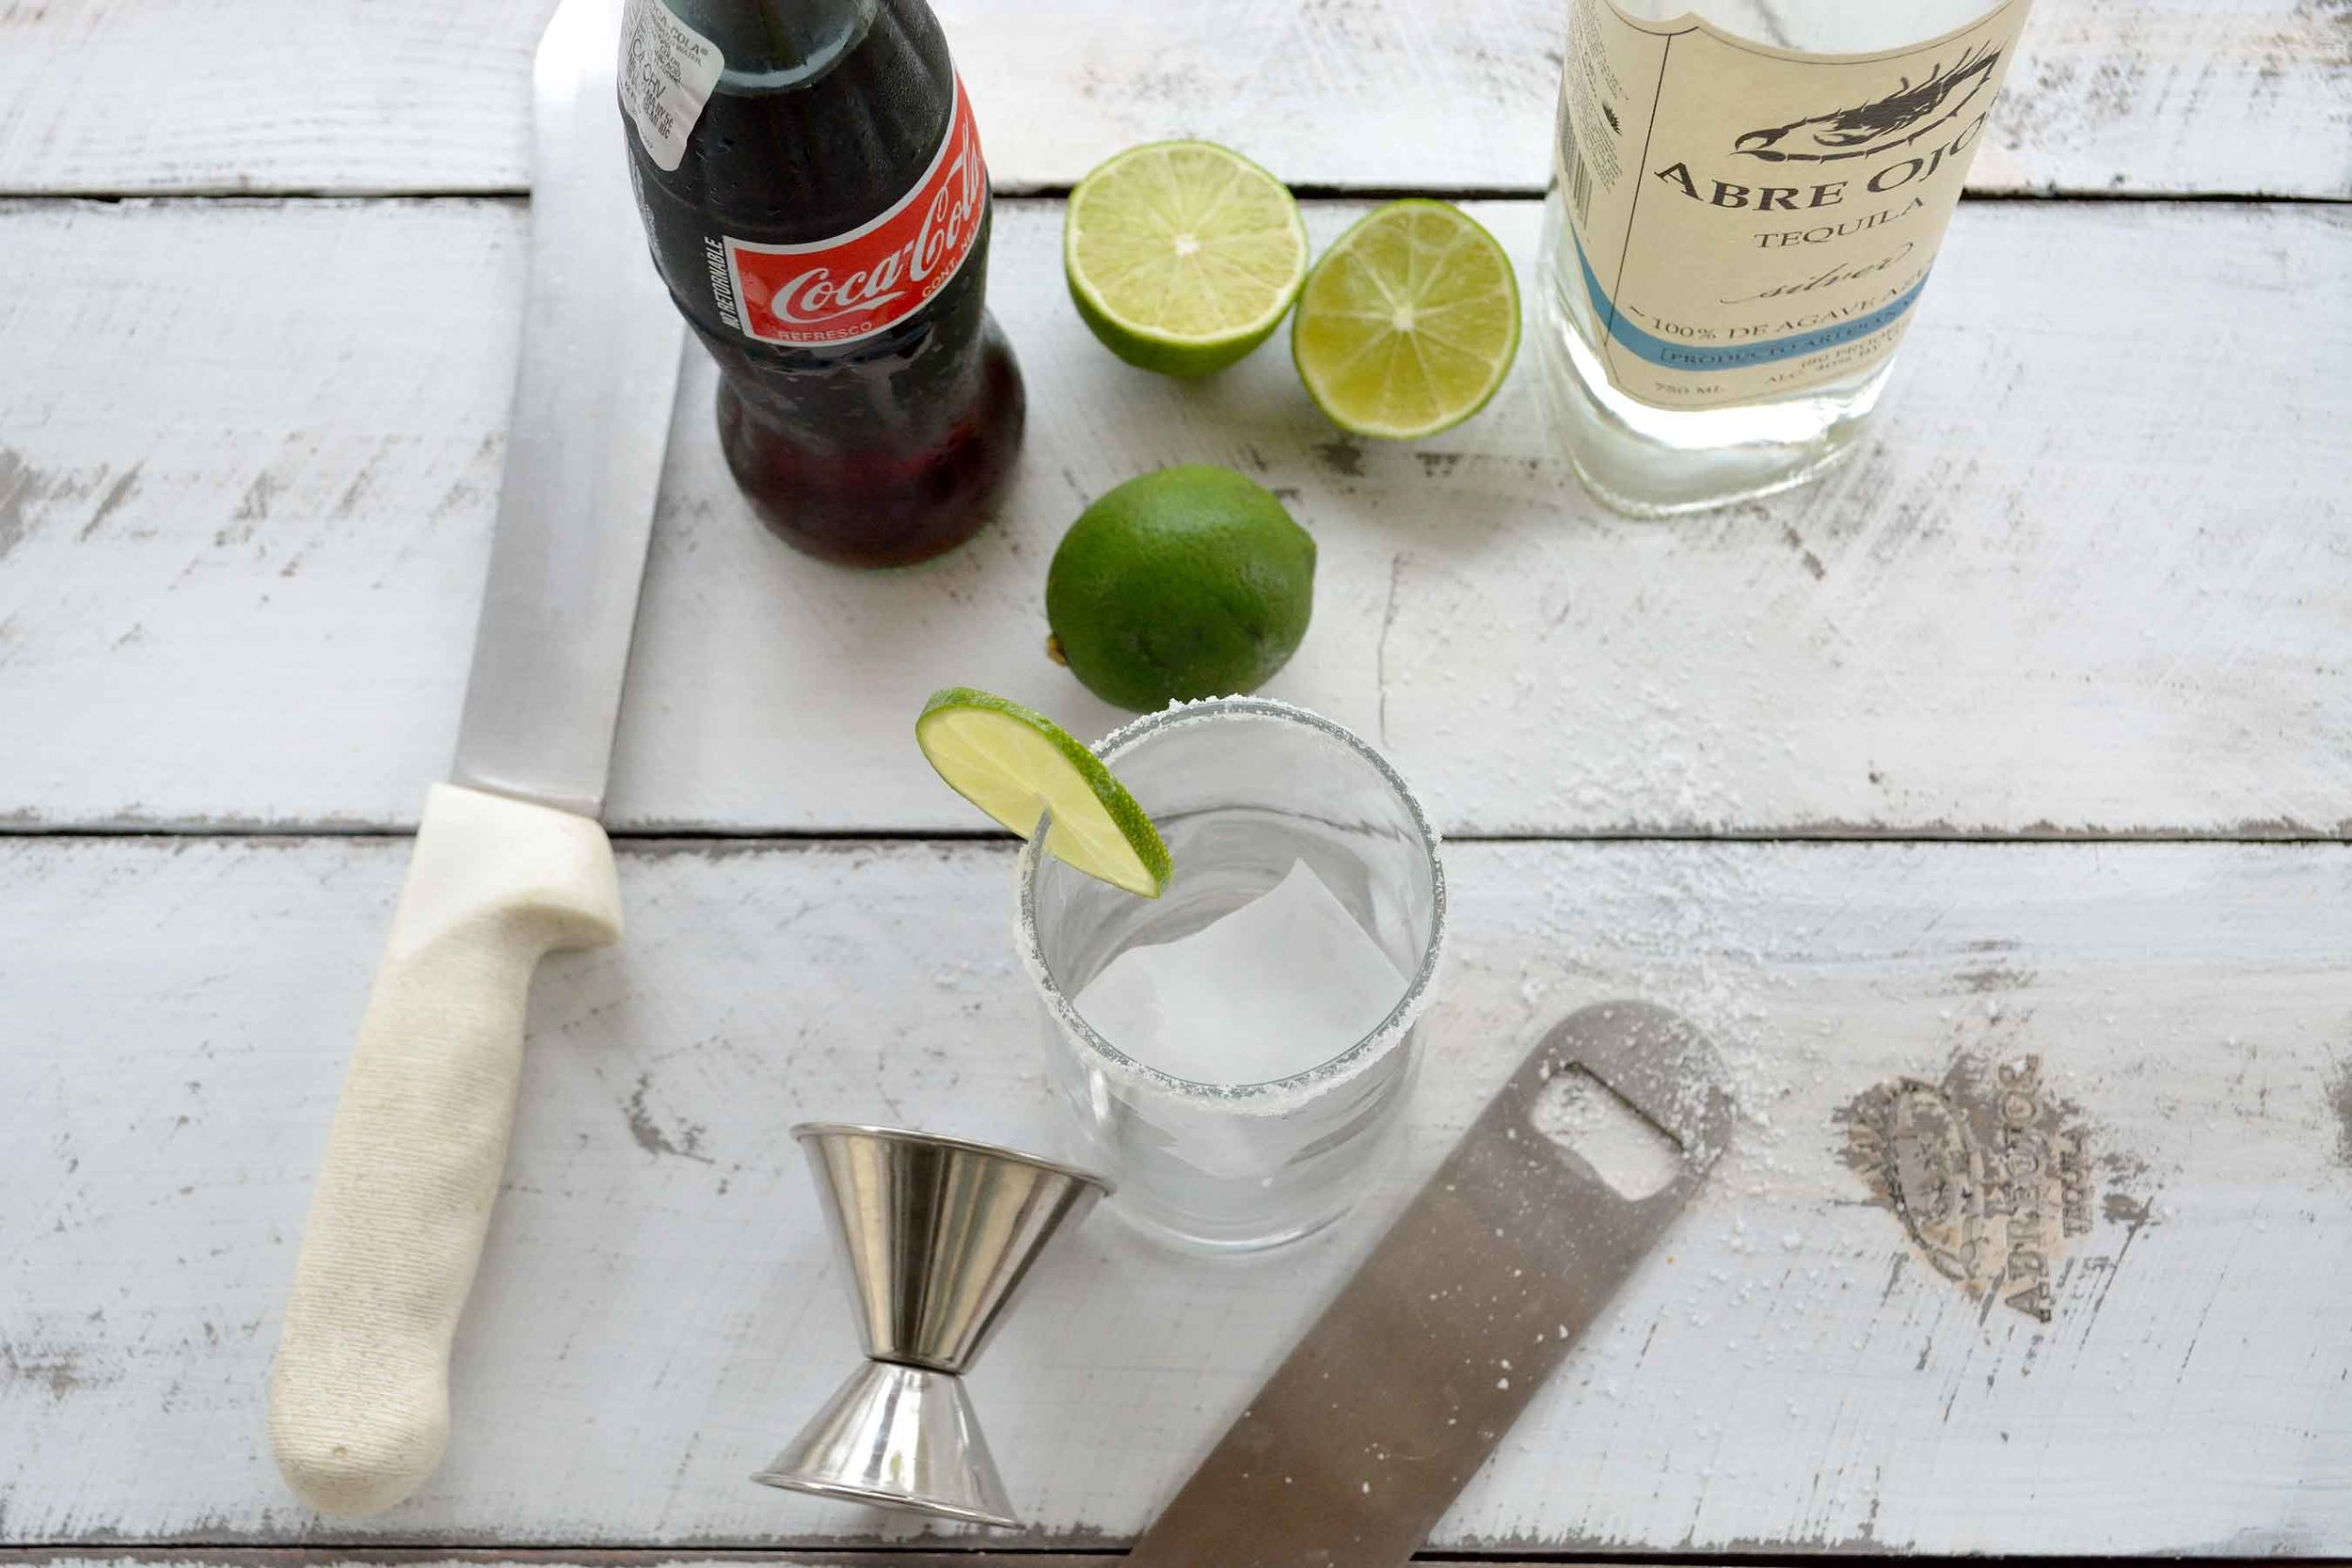 cocktails_abre_ojos_tequila_coca_cola.jpg